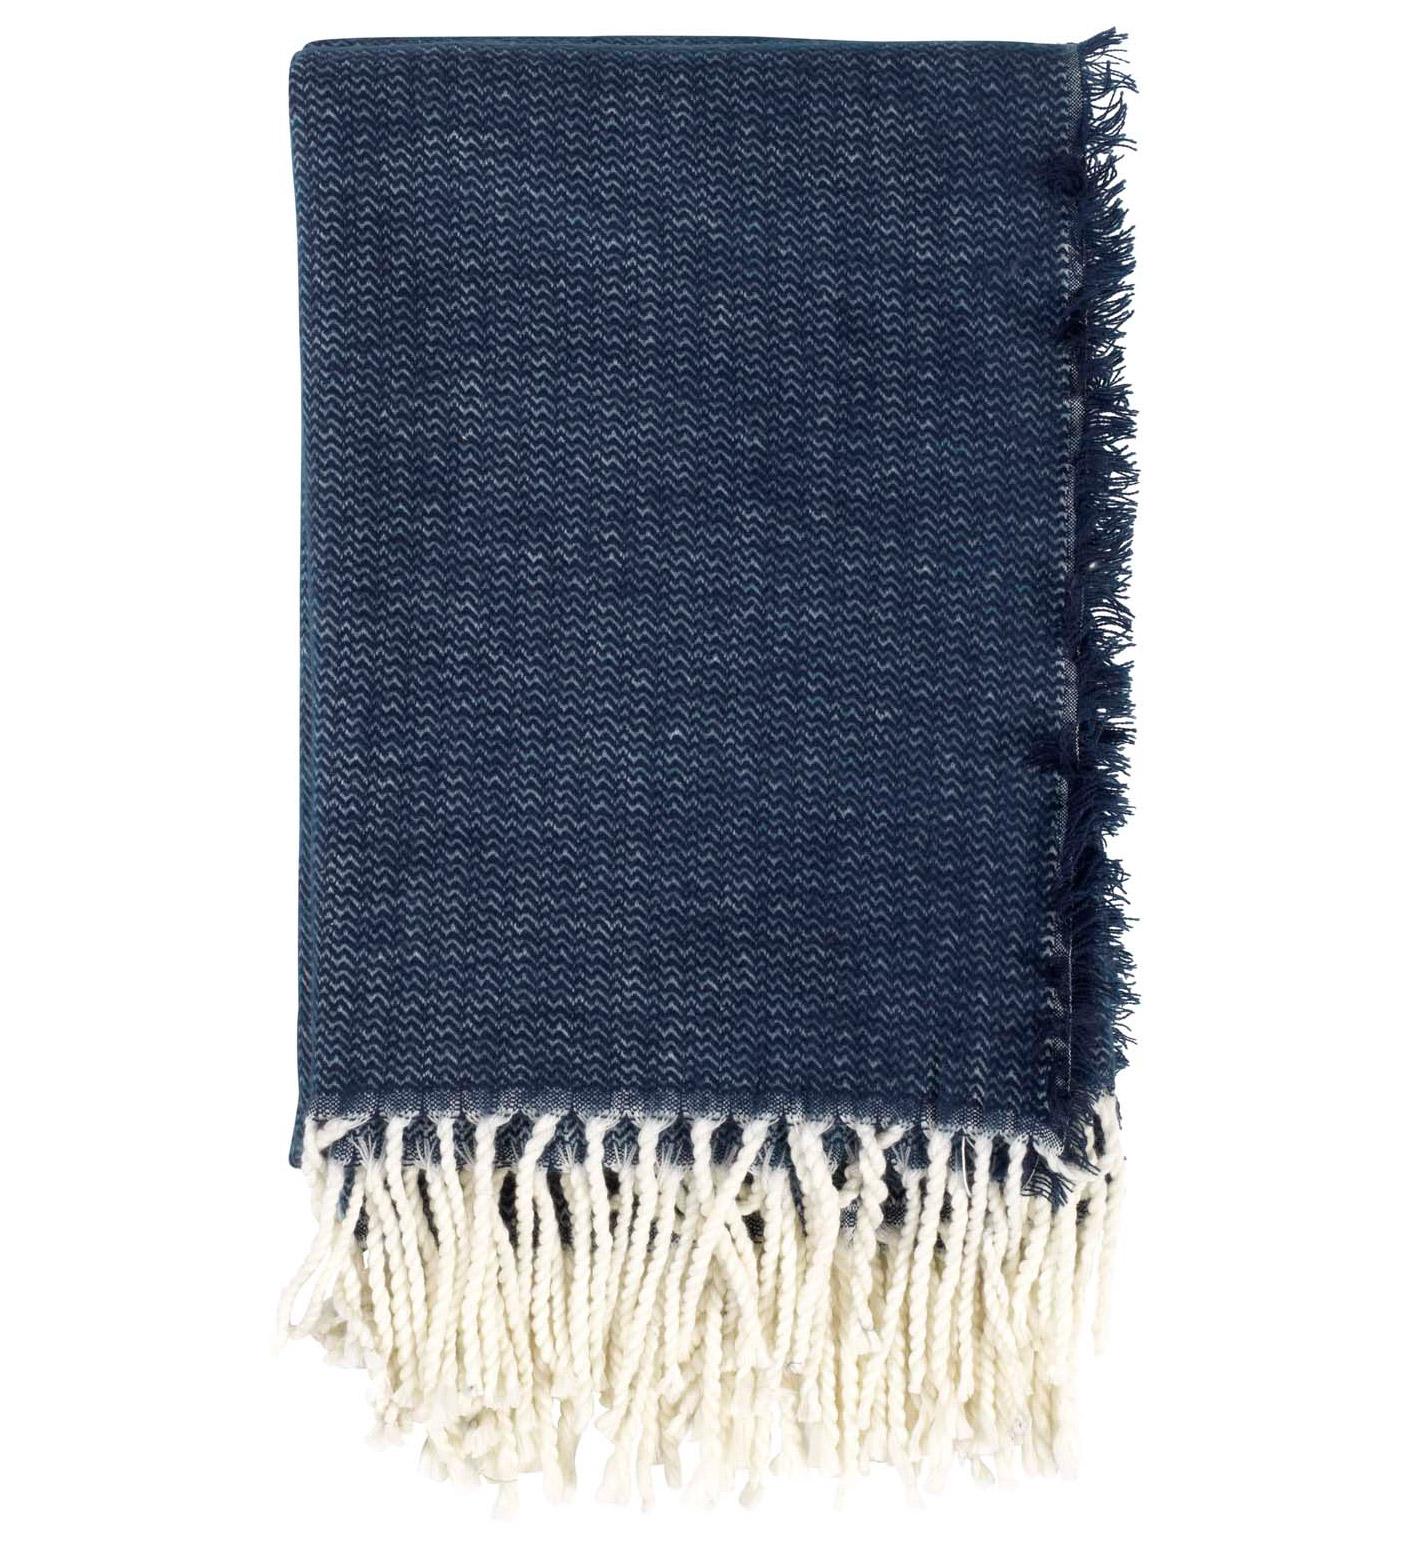 DANI - Plaid donkerblauw 130x170 cm